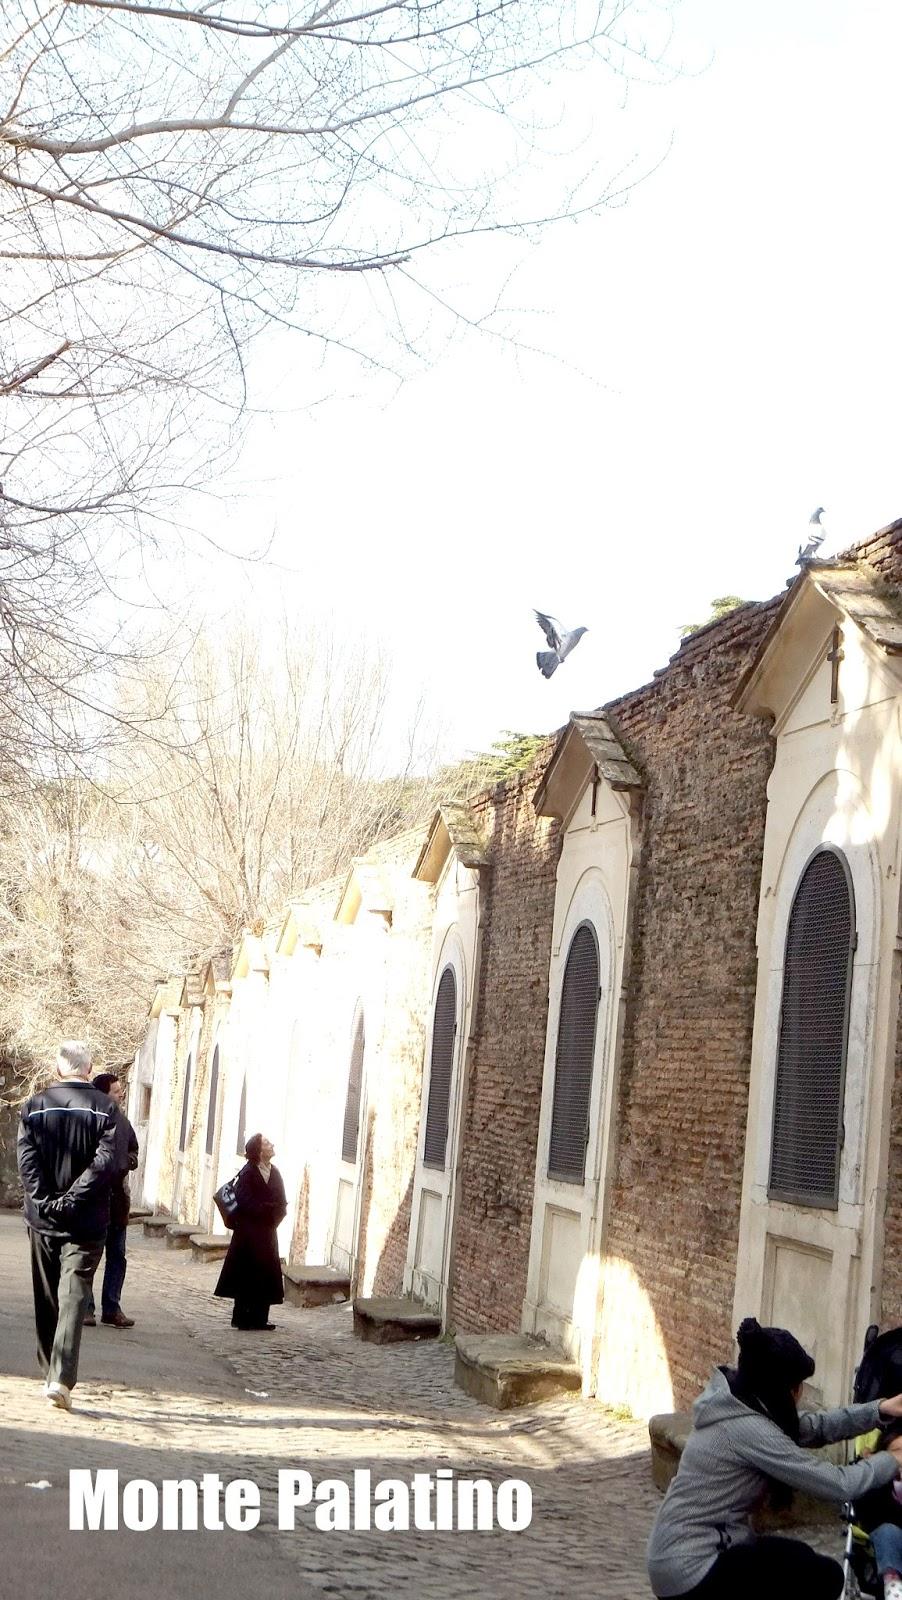 Monte Palatino, Roma, Elisa N, Blog de Viajes, Lifestyle, Travel